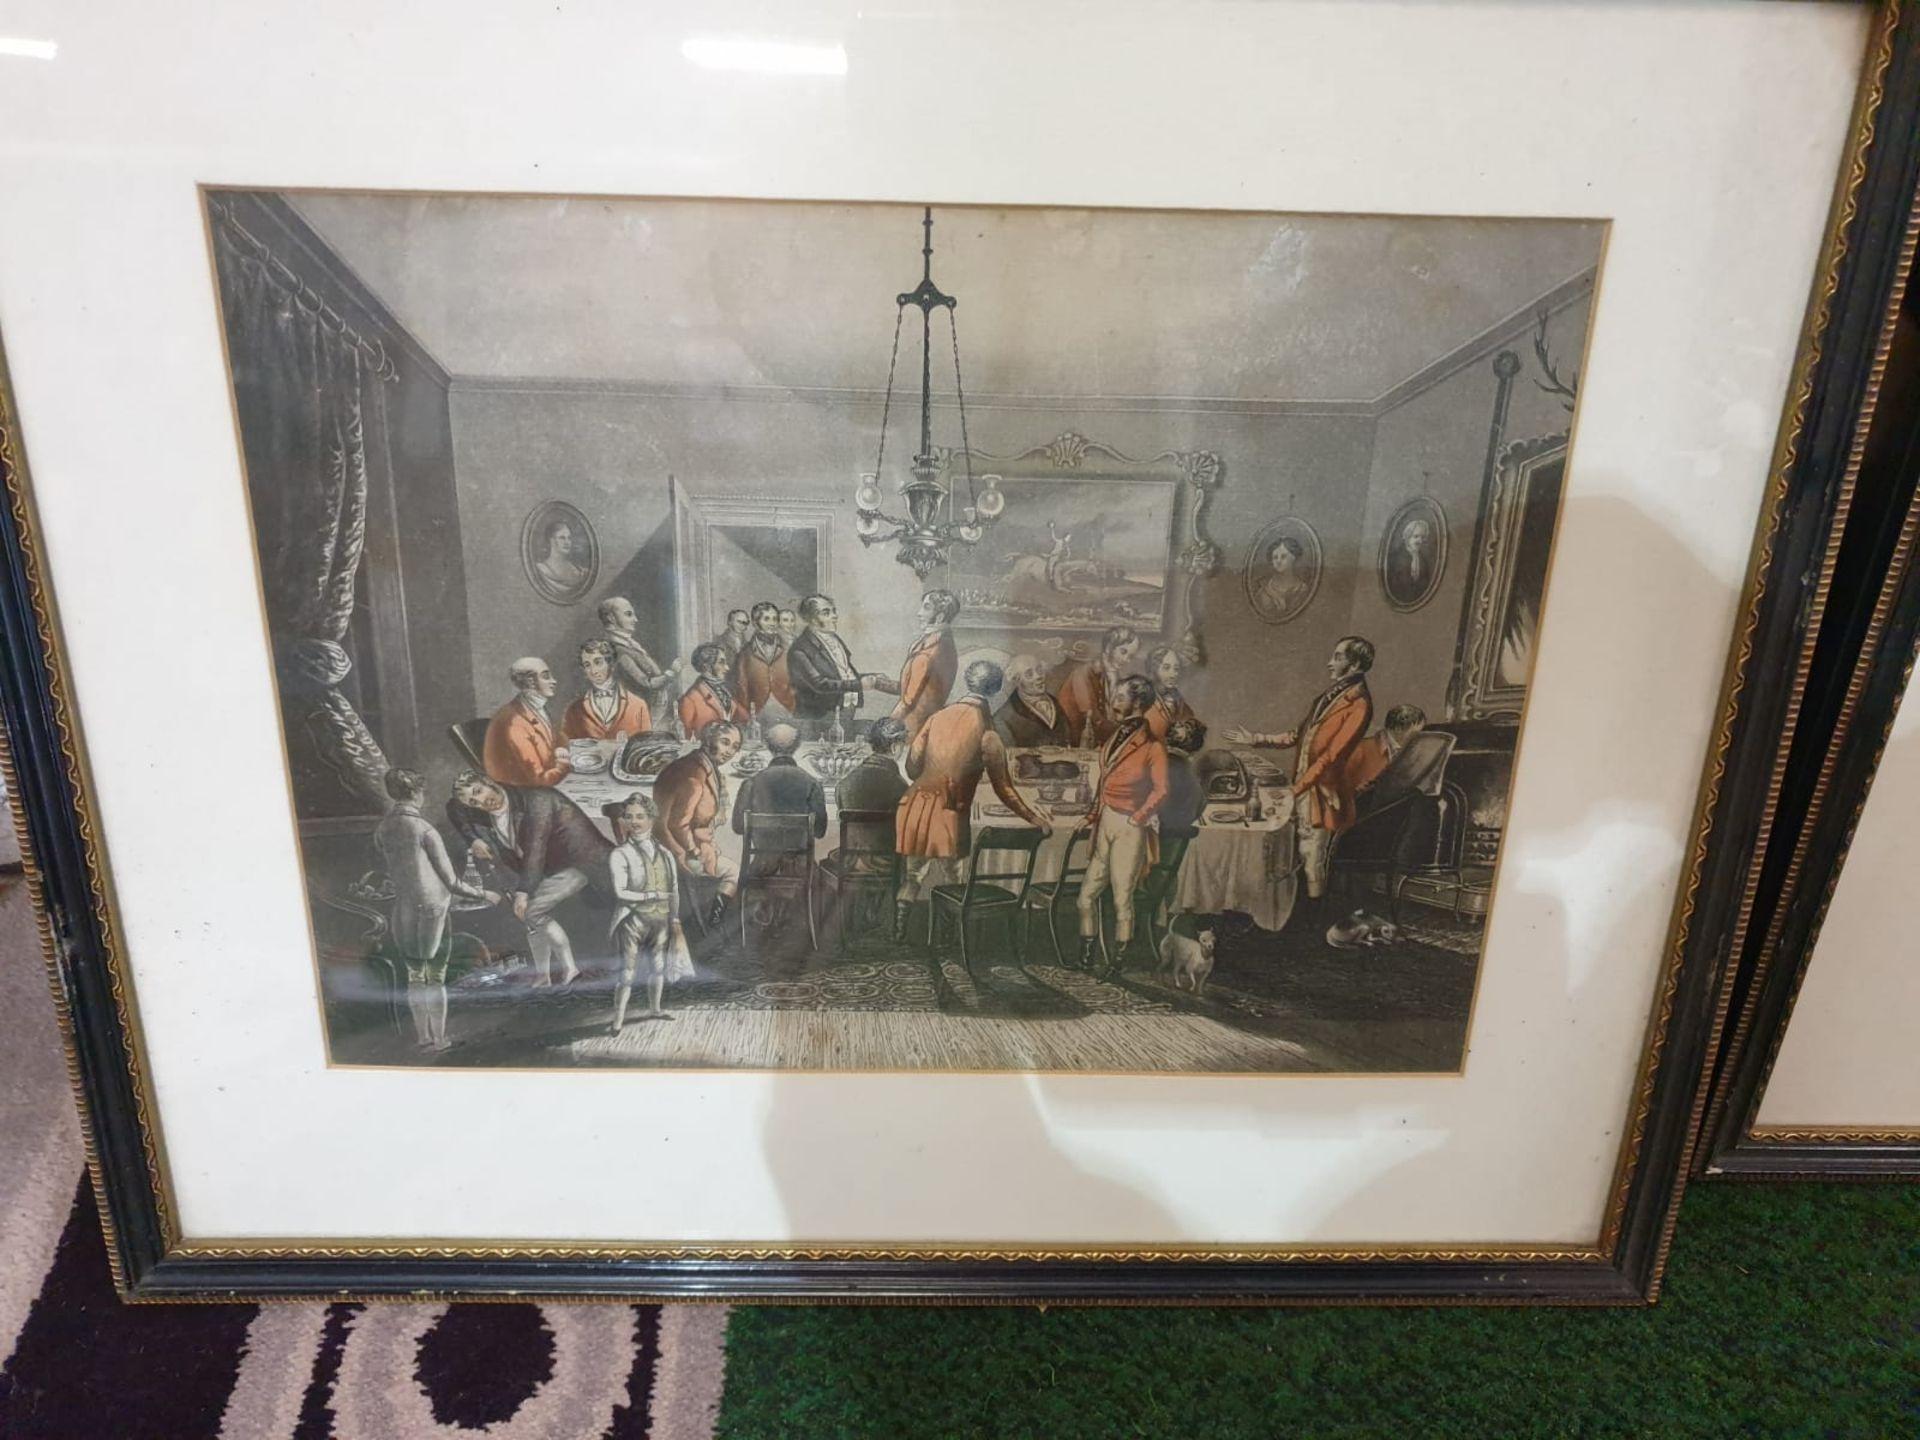 Set of 4 hunting aquatint prints in Black frame-50 x 42cm - Image 2 of 6